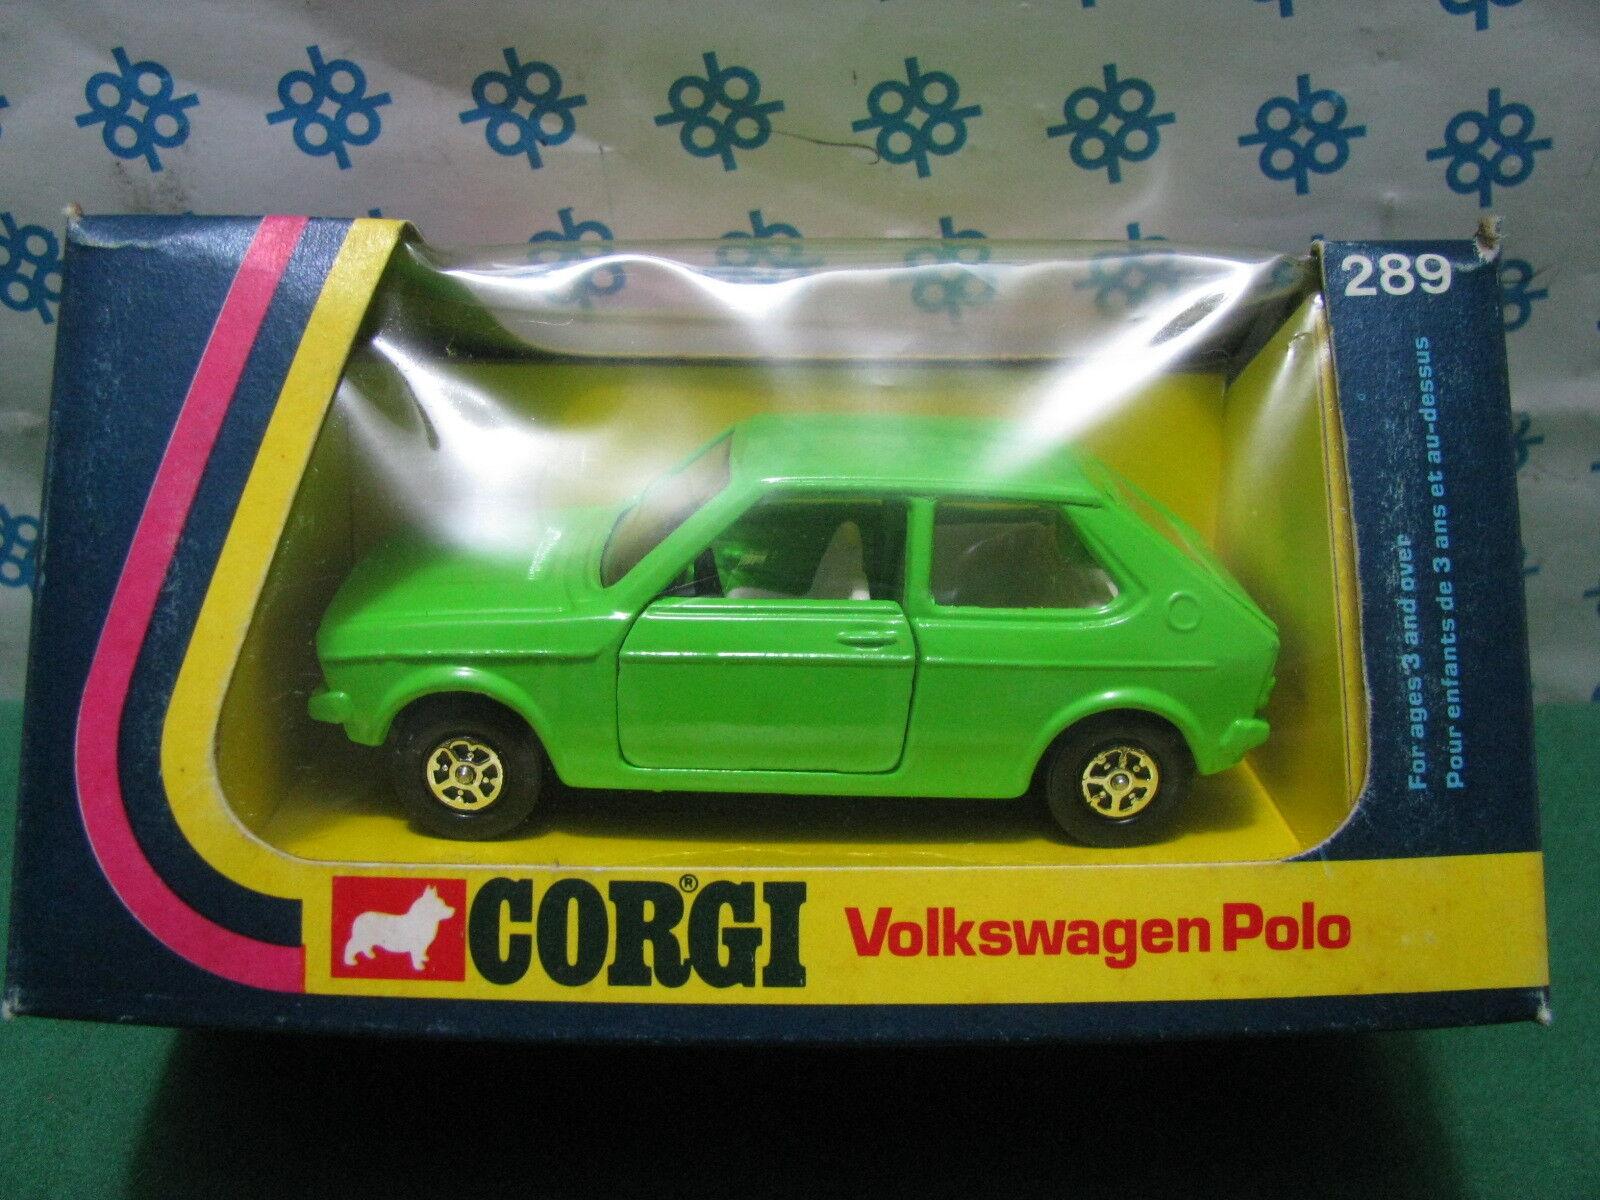 Corgi Toys 289 - Volkswagen Polo - Etat Parfait dans Boite